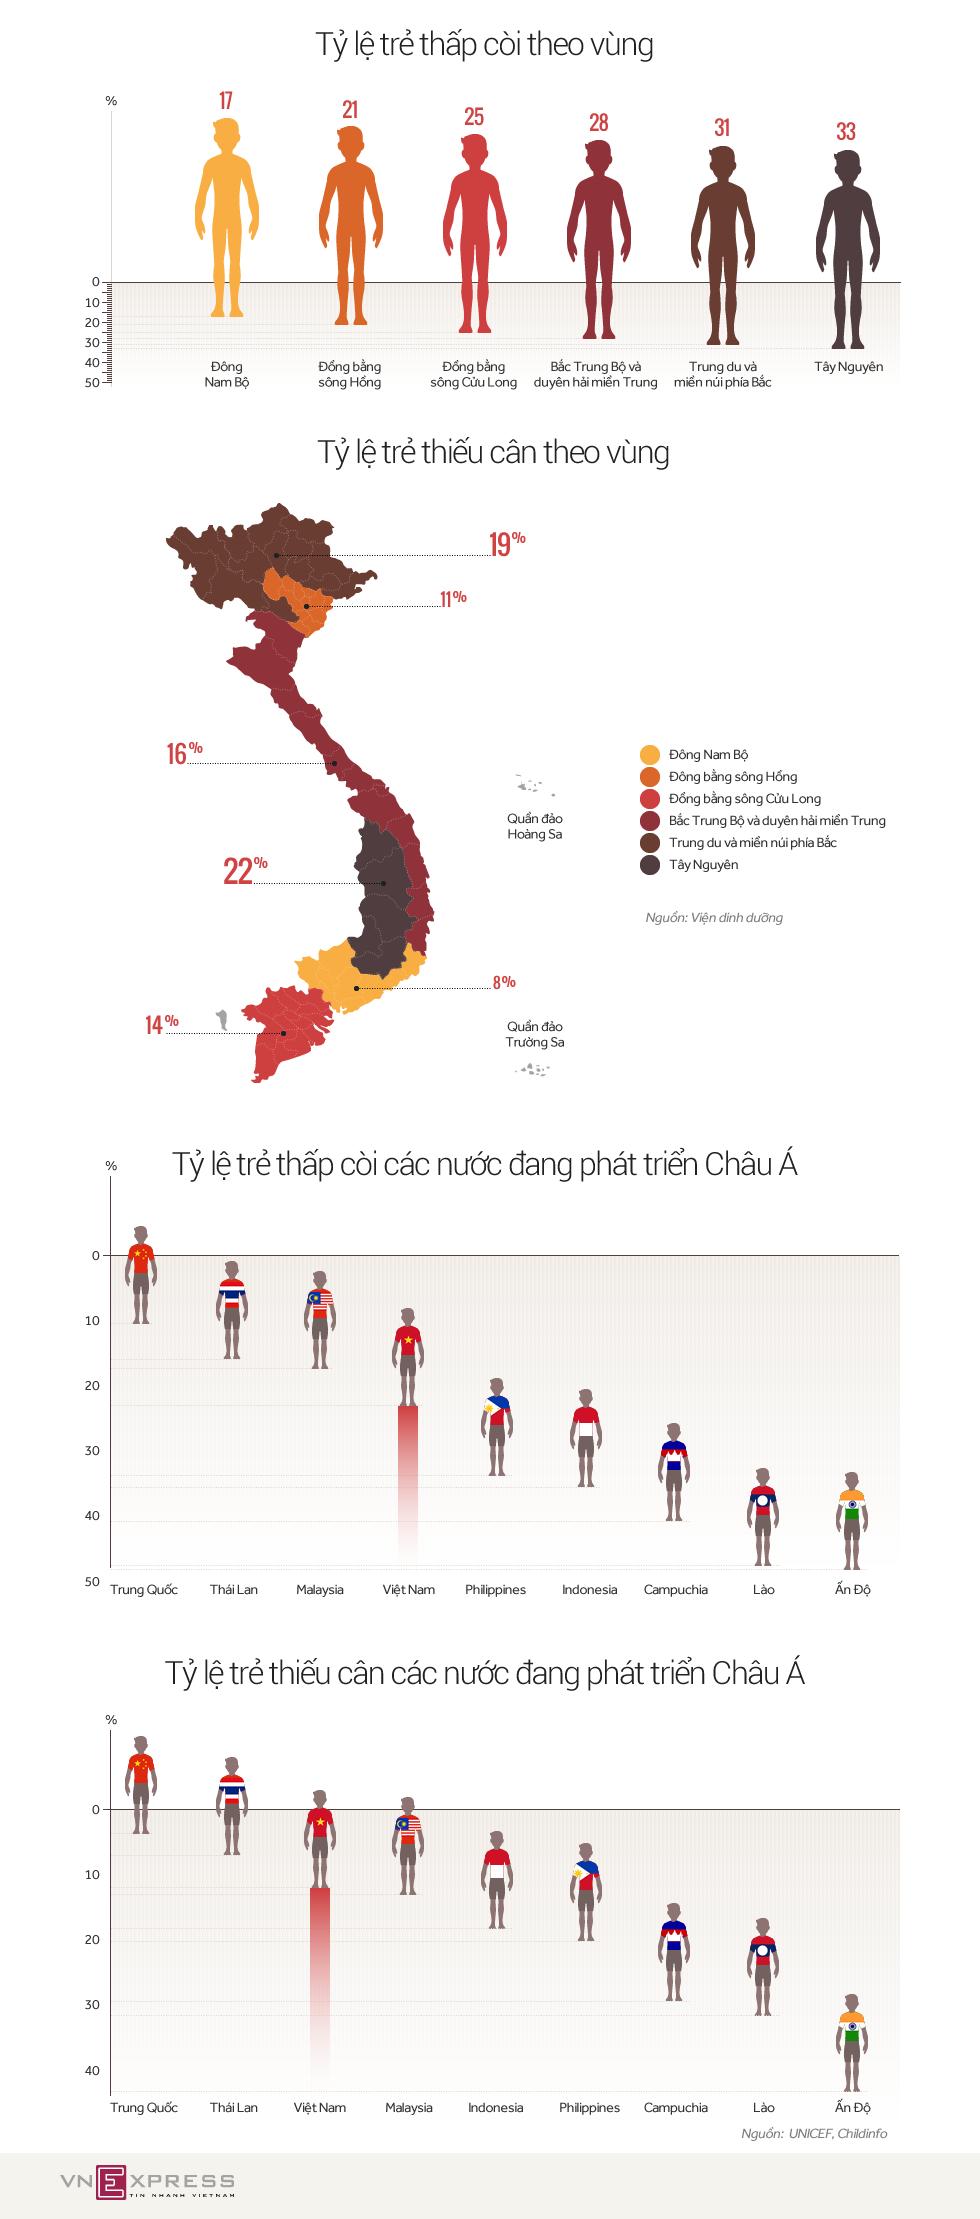 Trẻ em vùng nào cao nhất Việt Nam